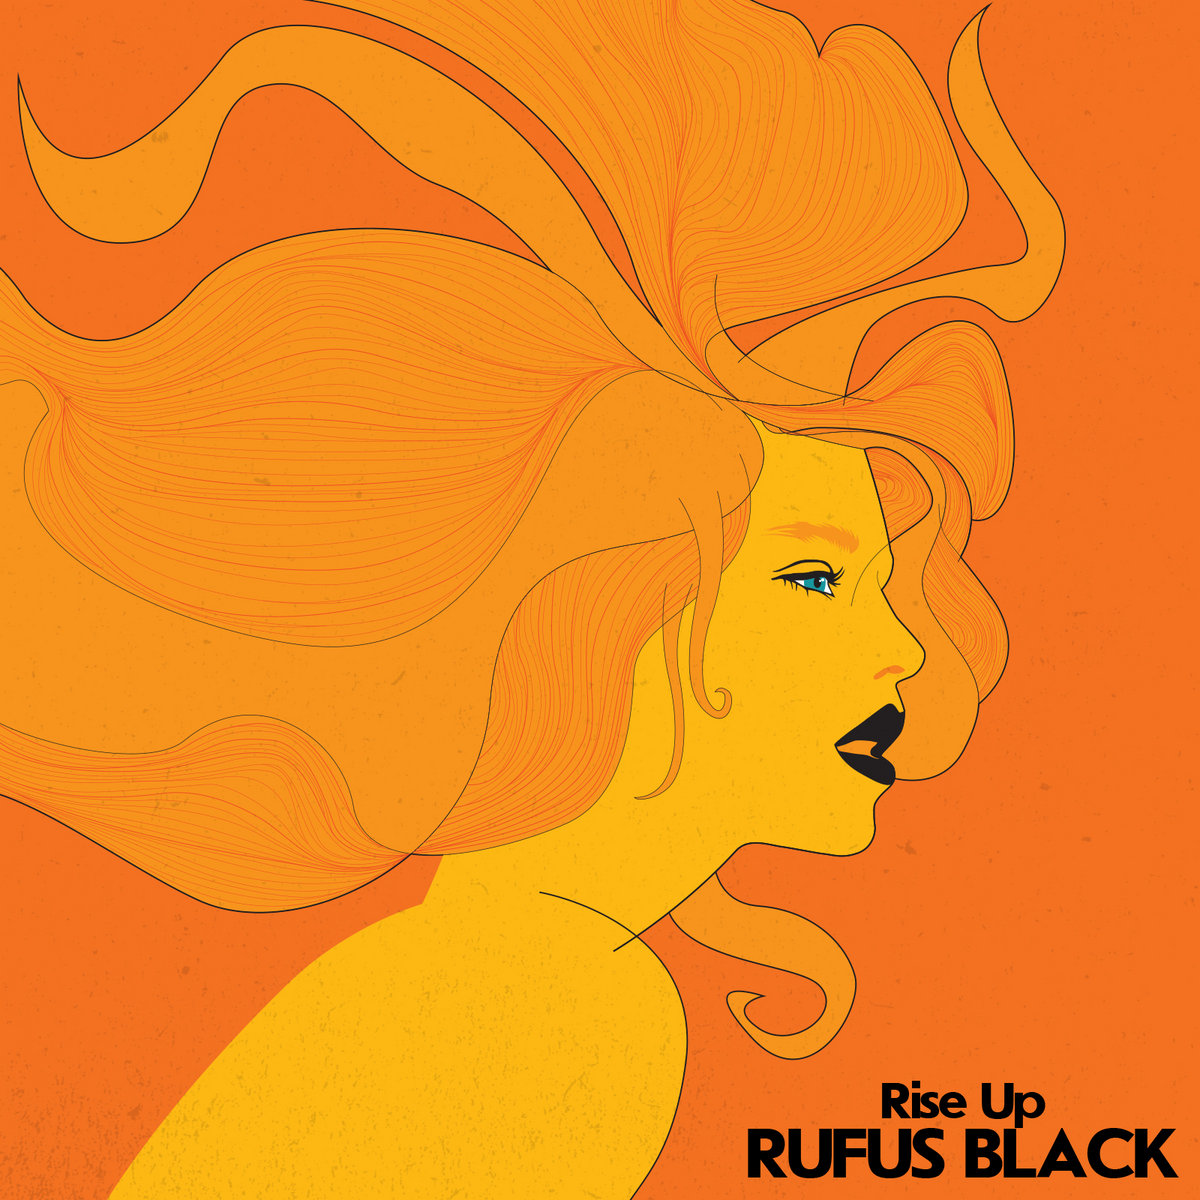 Rufus take me (original mix) youtube.